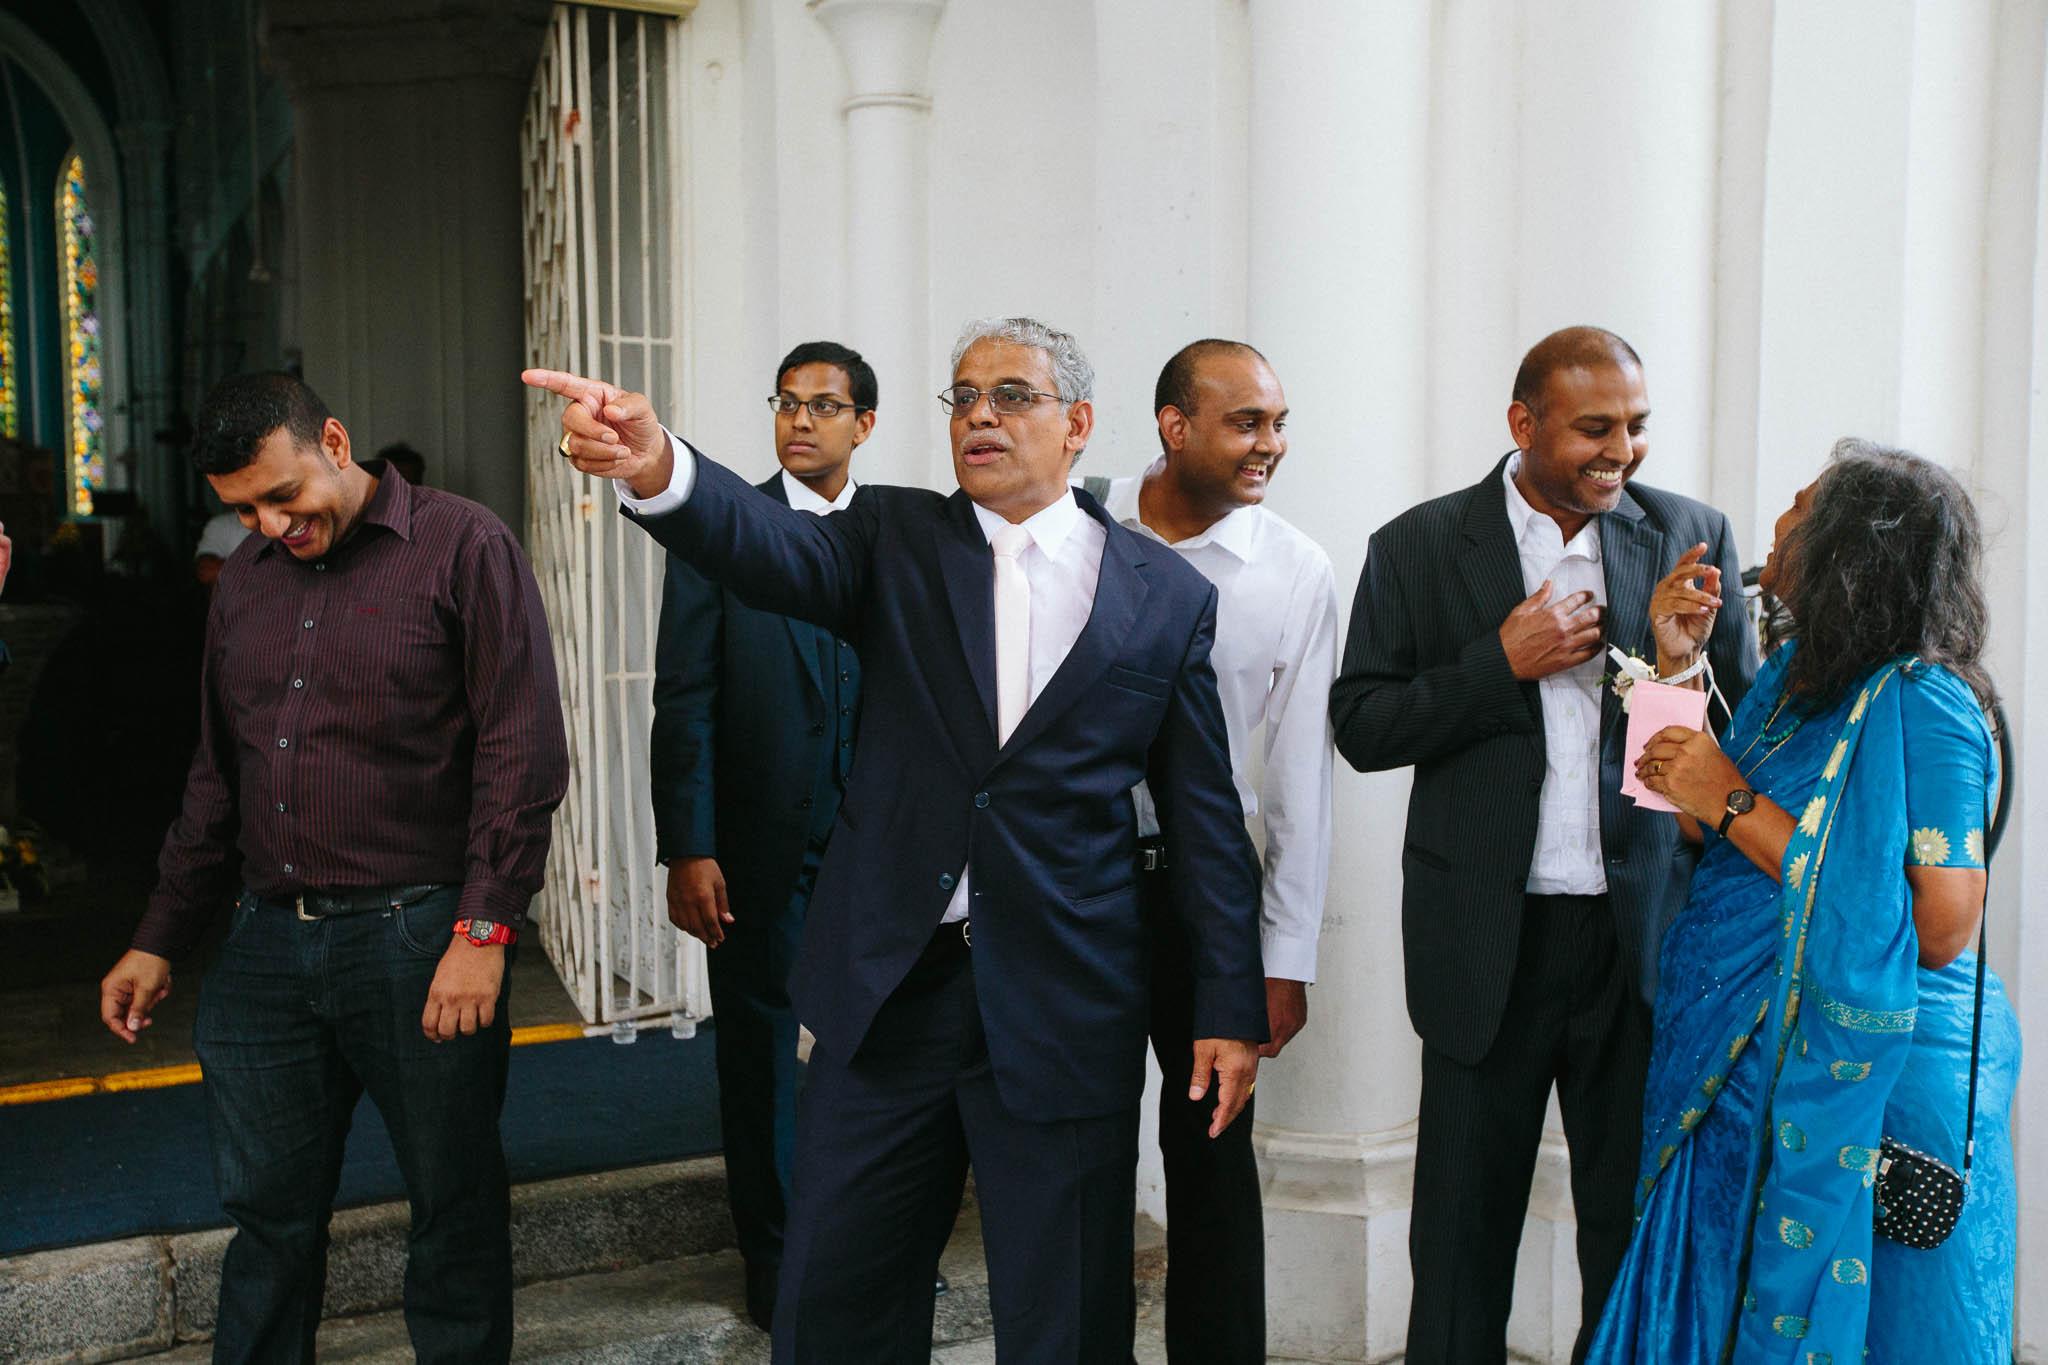 singapore-wedding-photographer-st-andrews-cathedral-renita-david-39.jpg